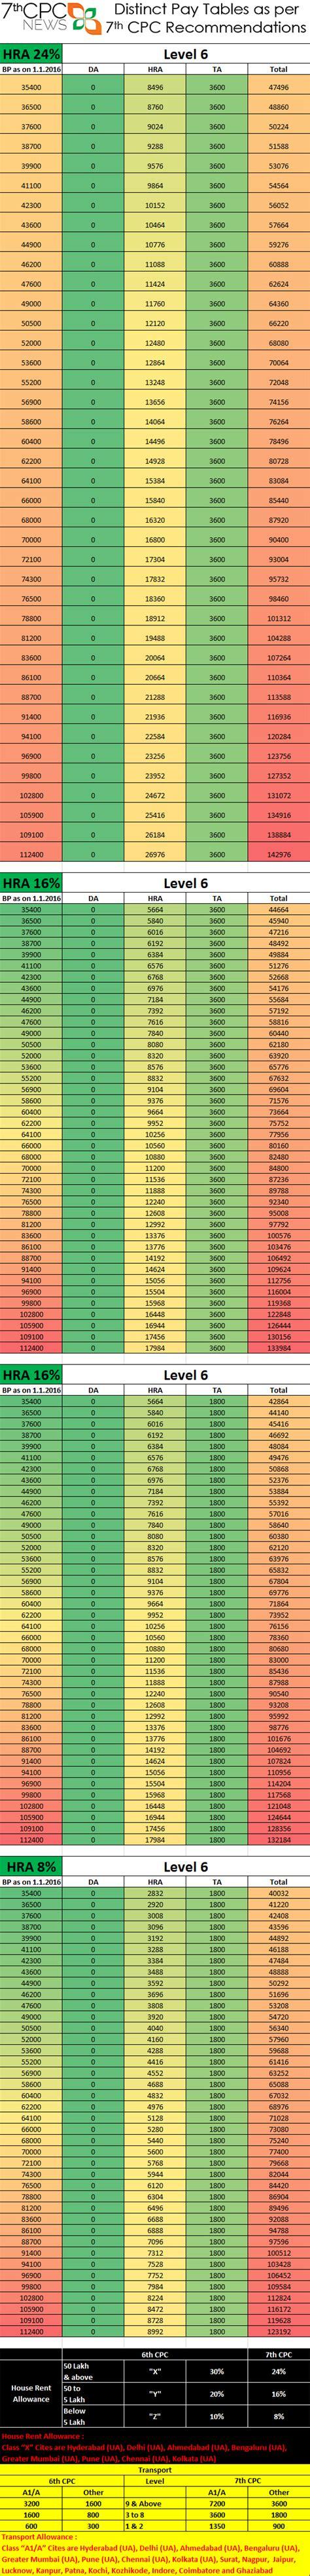 pcda circular 547 revised pension in ro jcosor pcda pension latest circular 555 newhairstylesformen2014 com